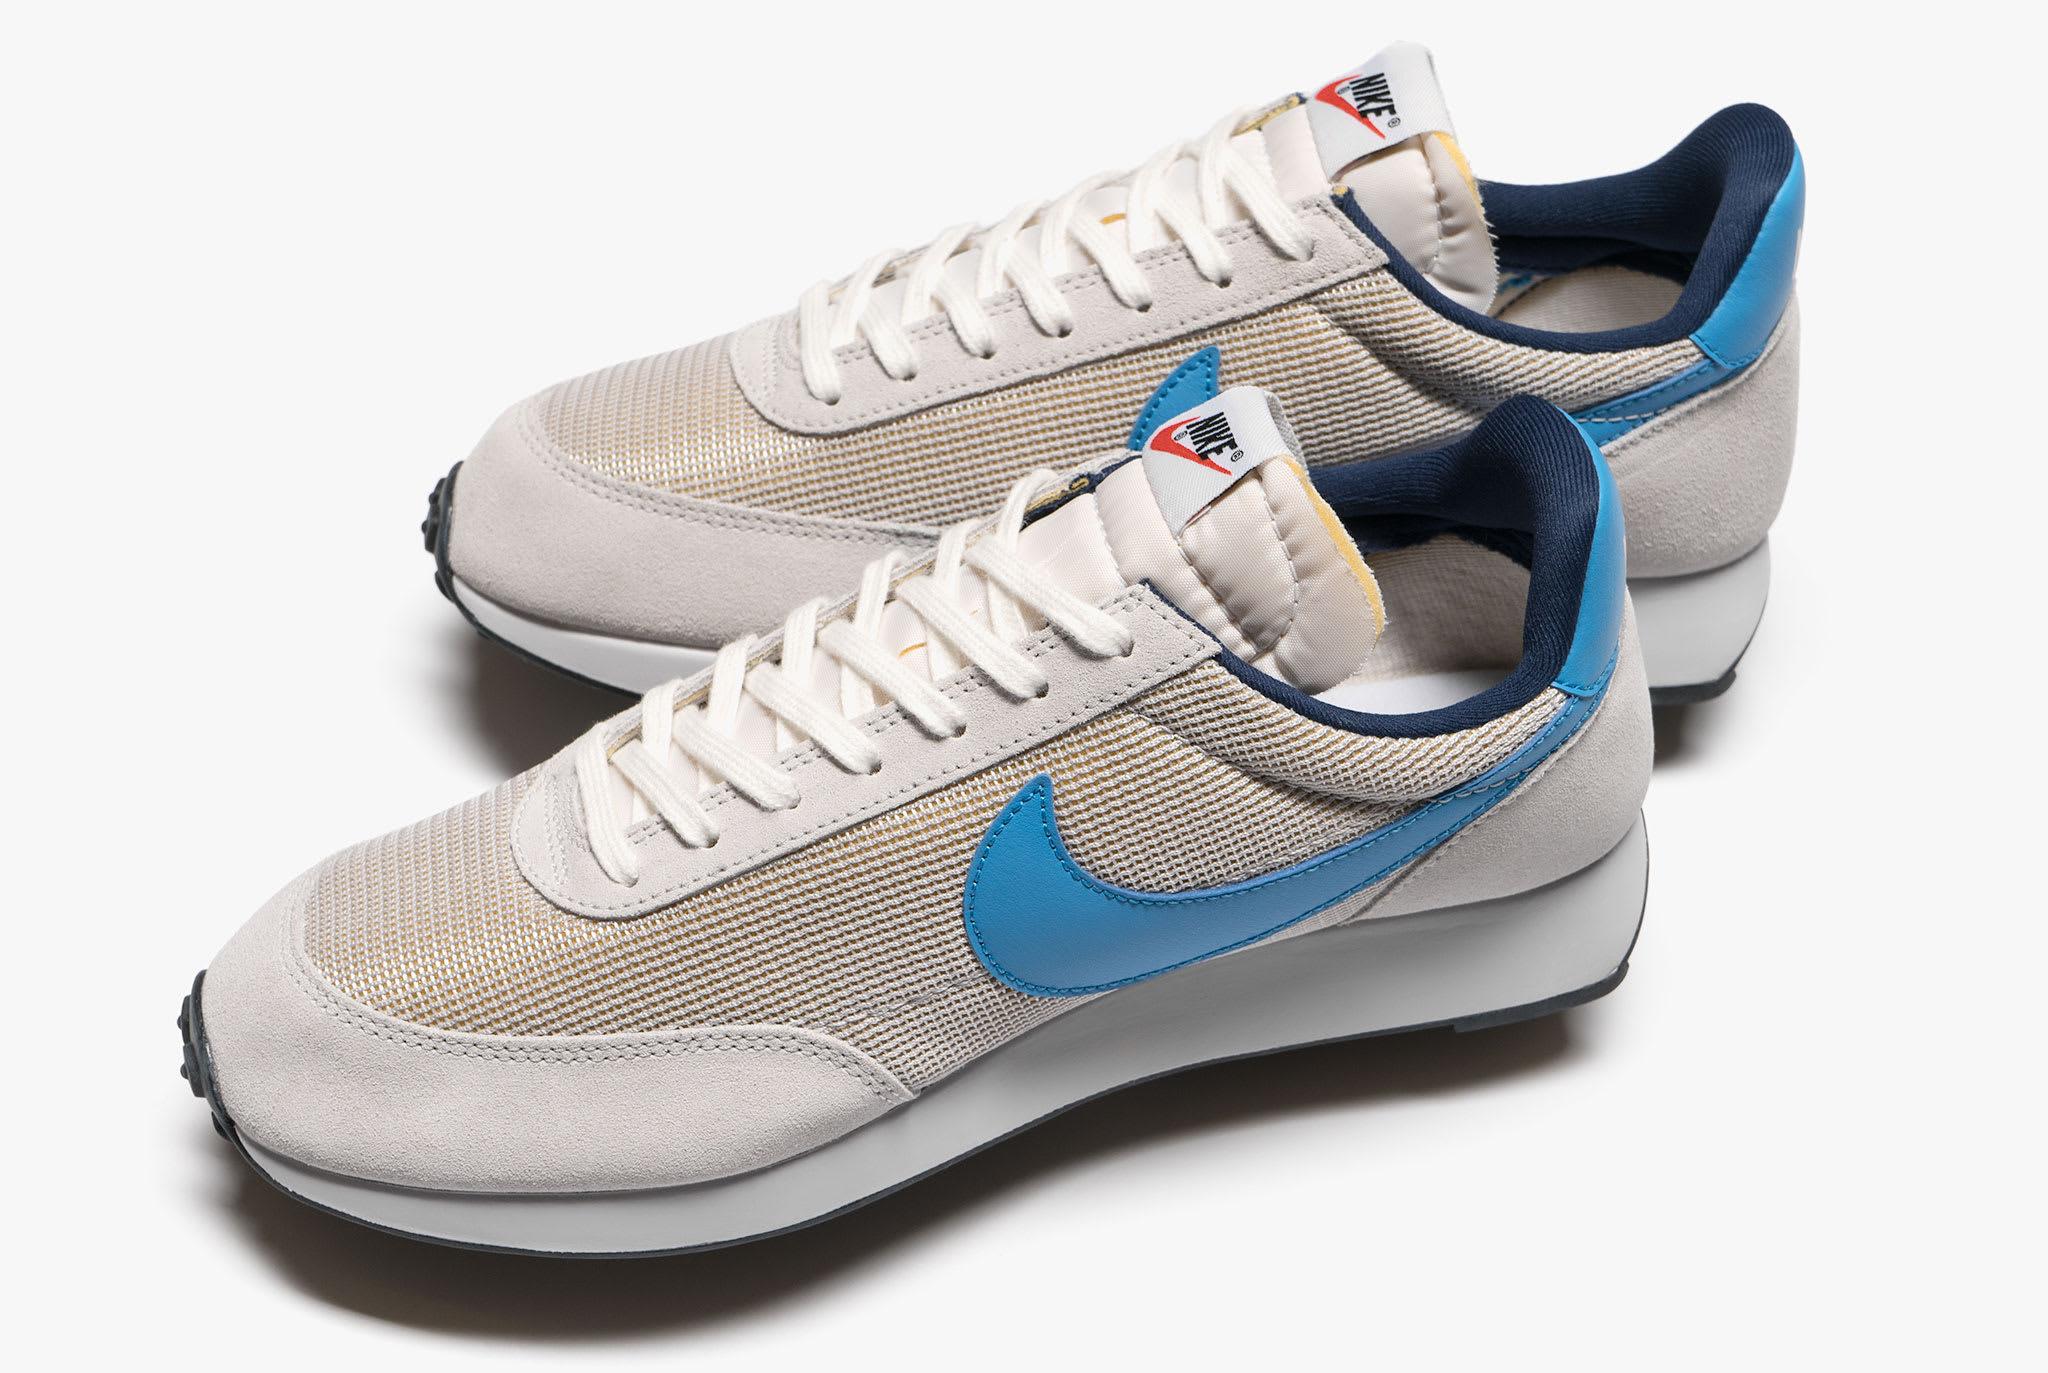 Nike Air Tailwind 79 OG | Now Available